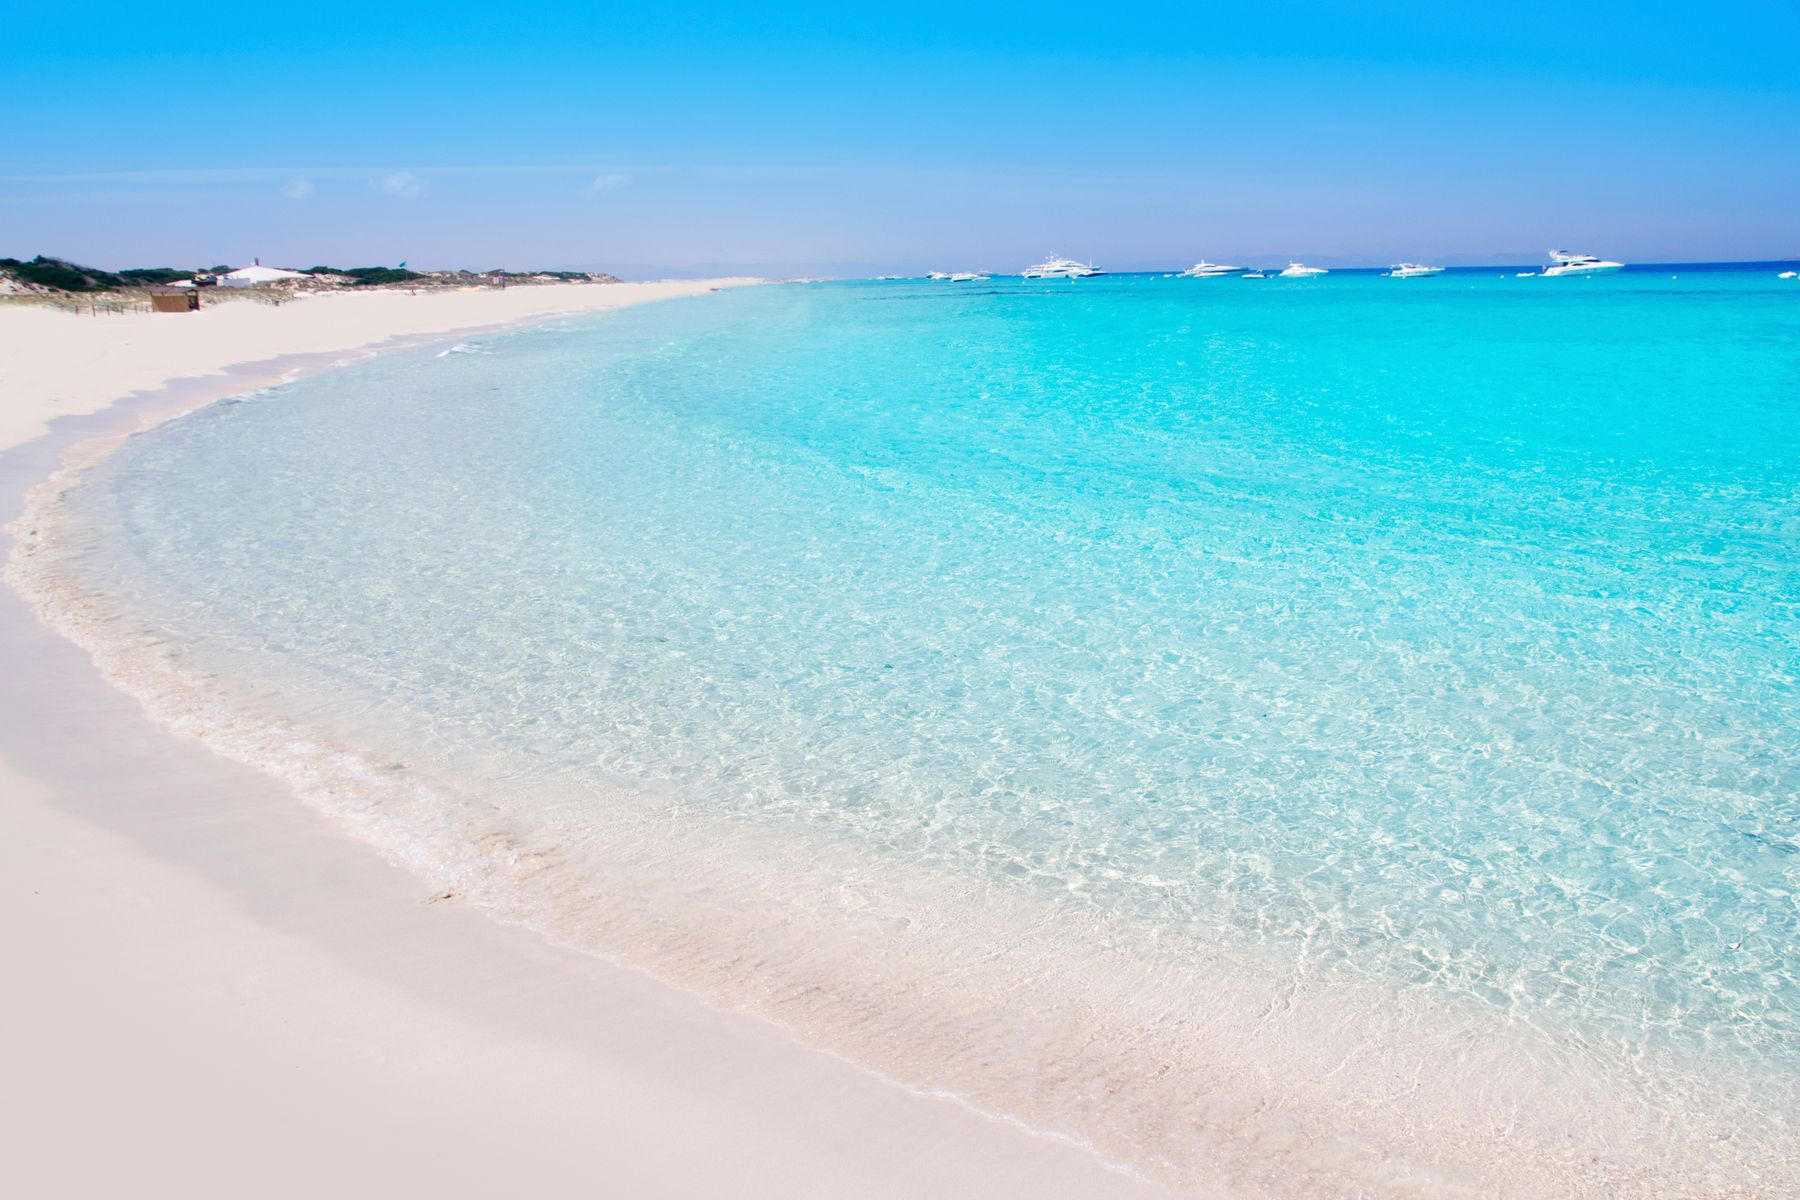 Spiagge Formentera: Ses Illetes